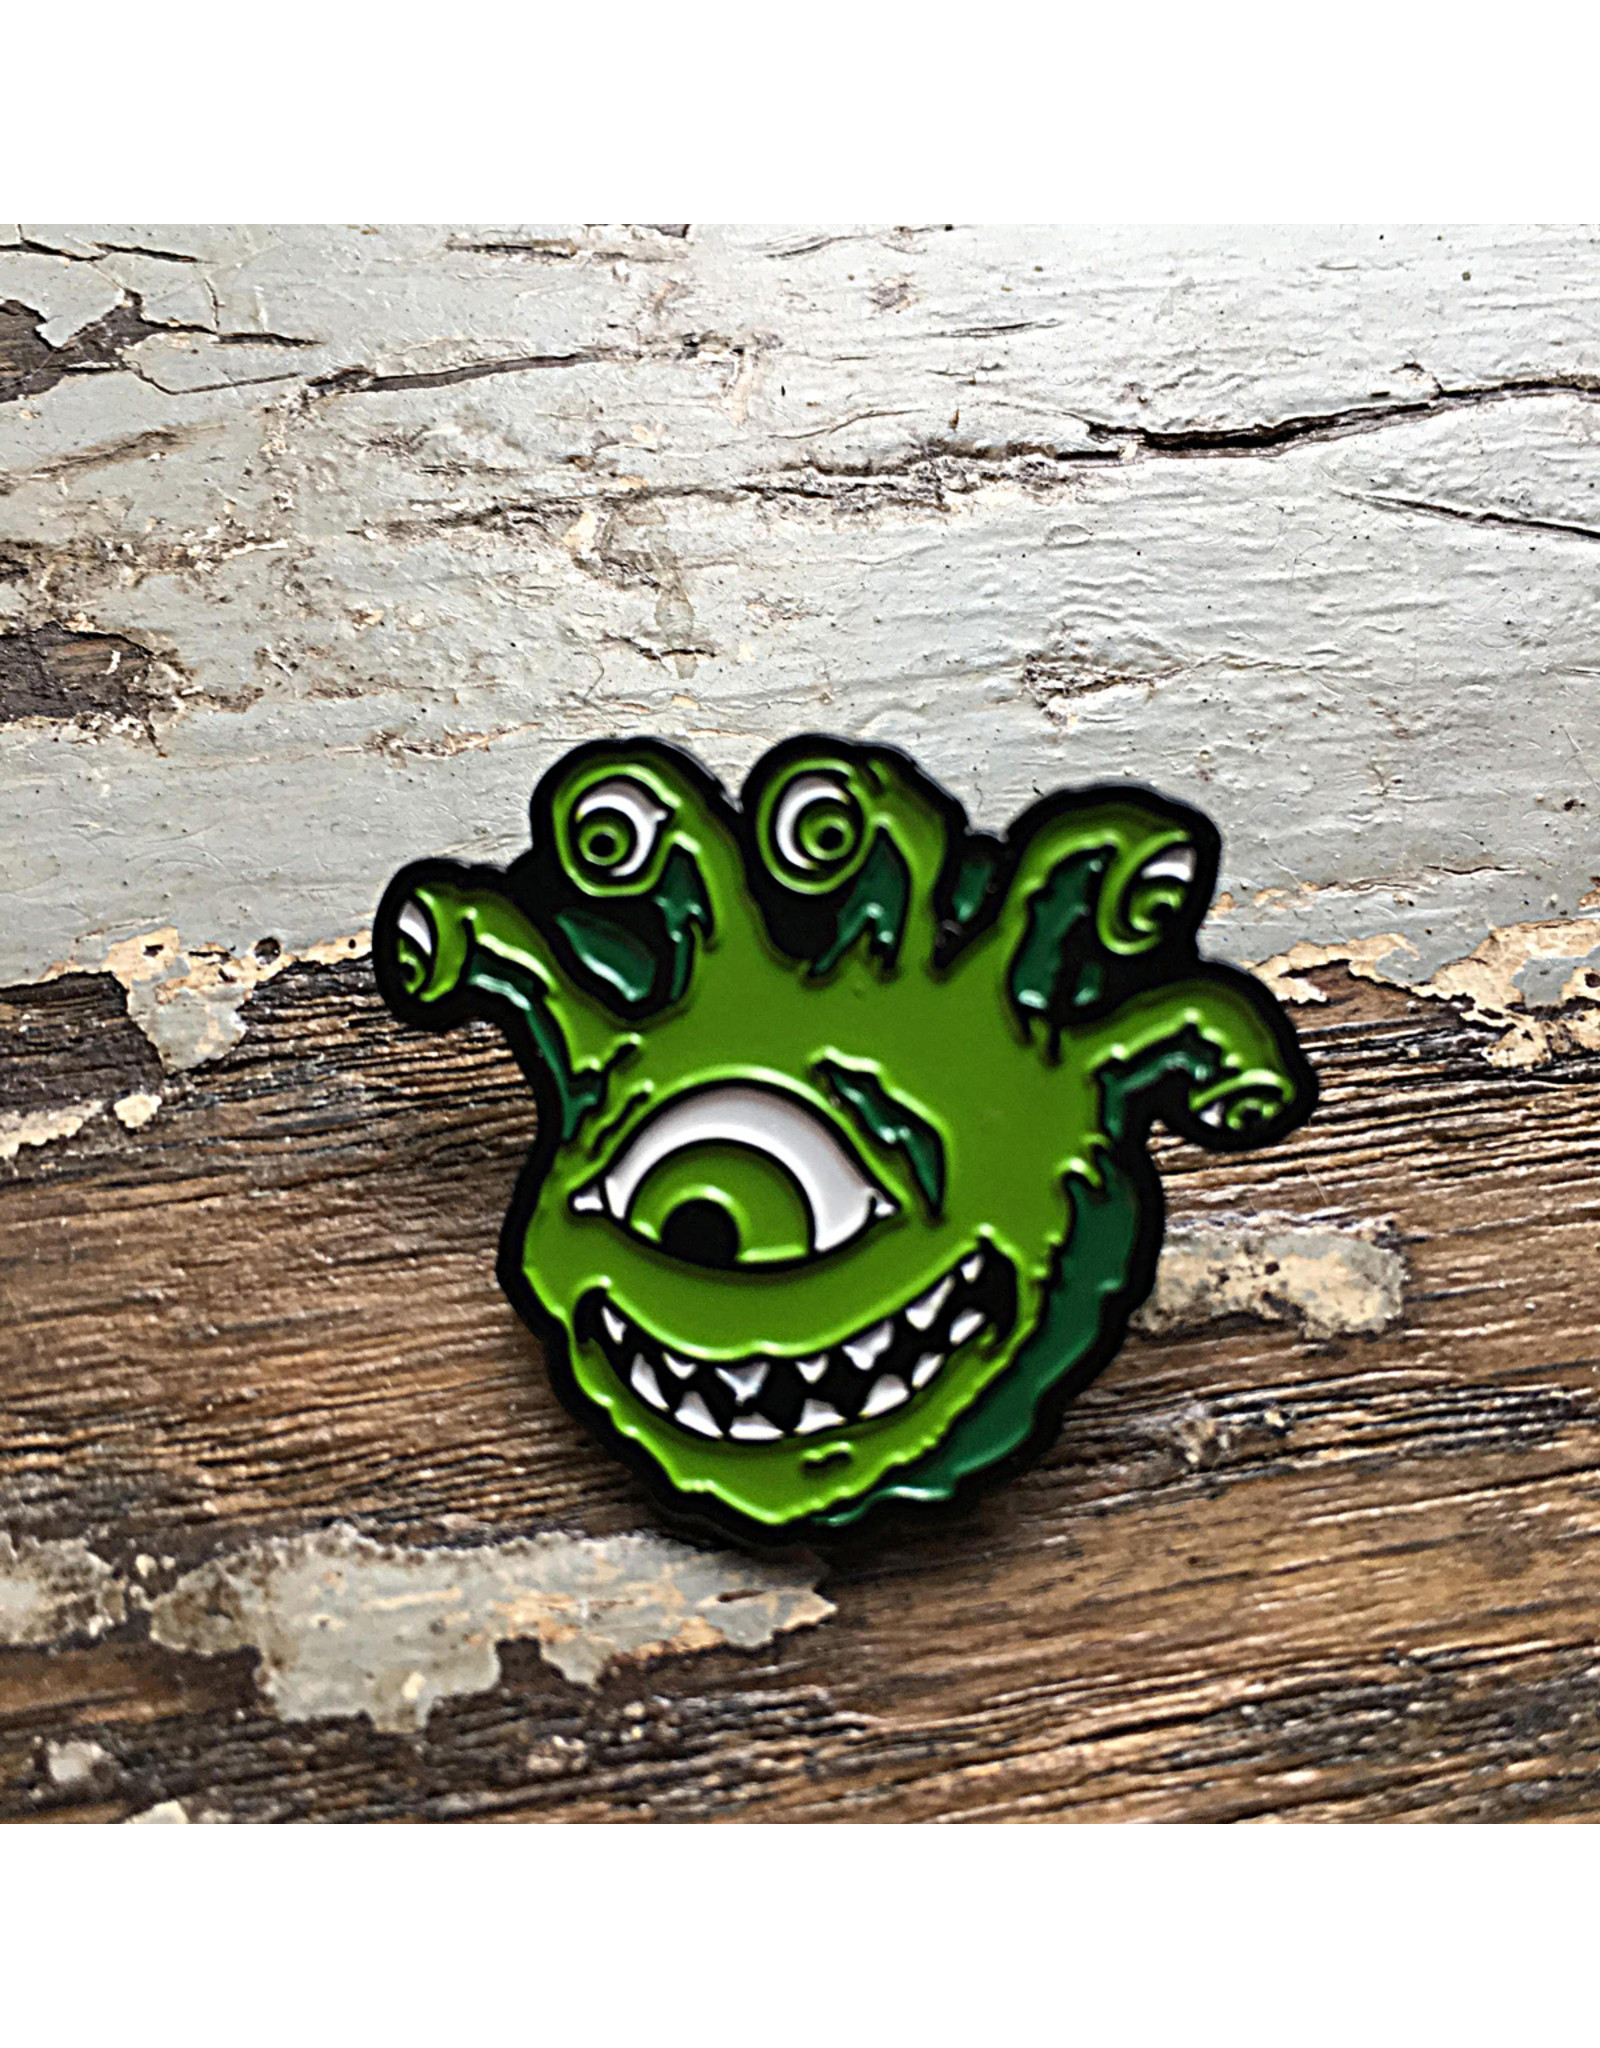 Creature Curation Eyegor Green – Pin